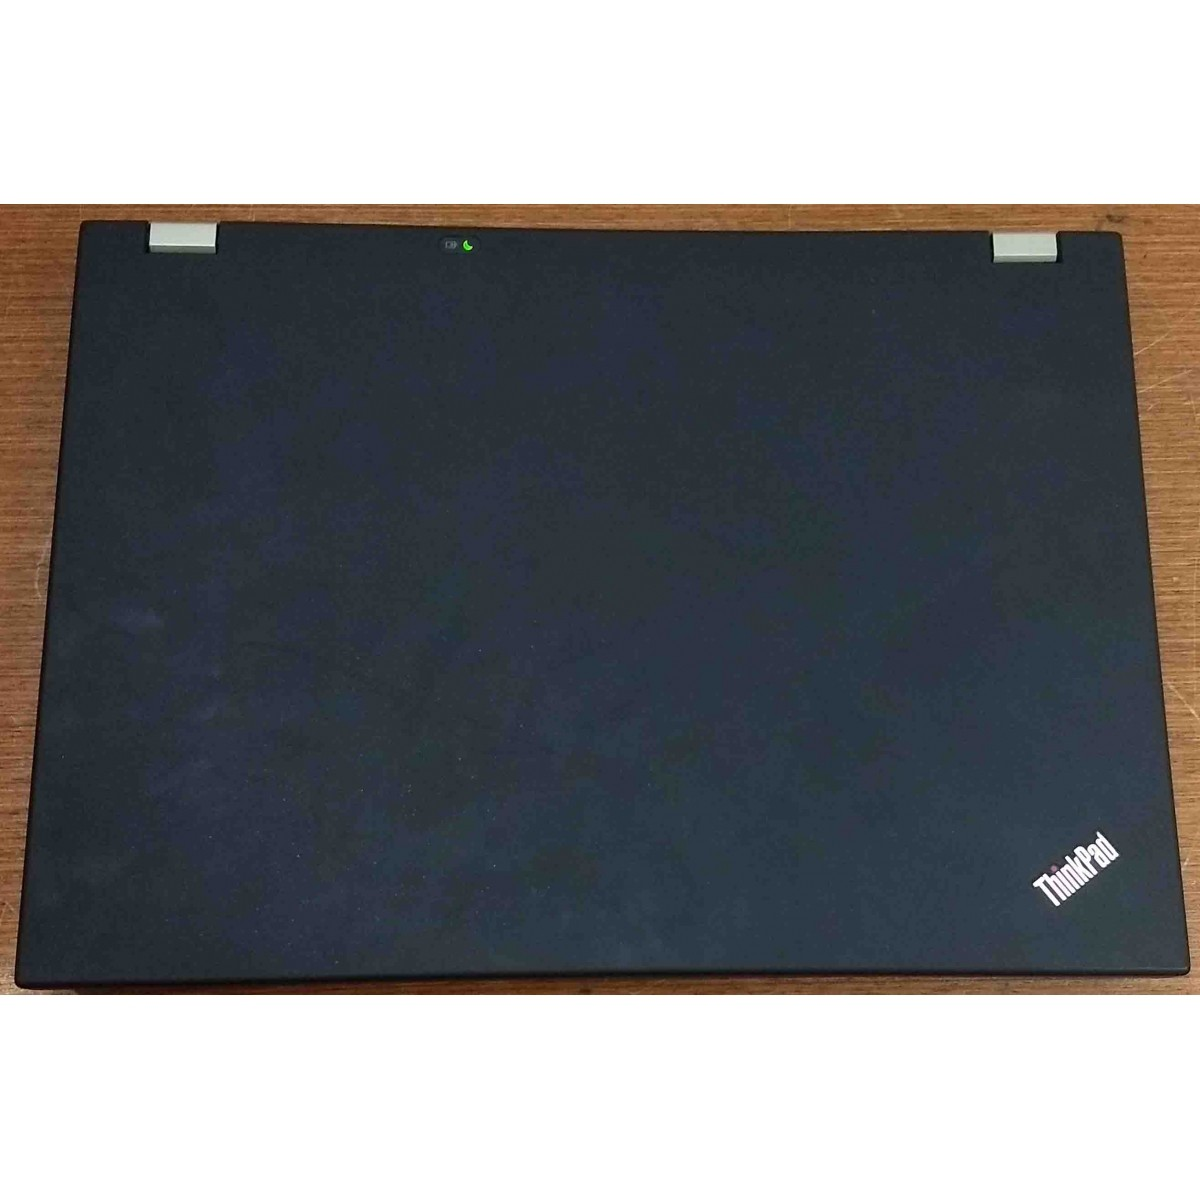 Notebook Lenovo Thinkpad T410 14.1'' Intel Core i5 2.4GHz 4GB HD-250GB